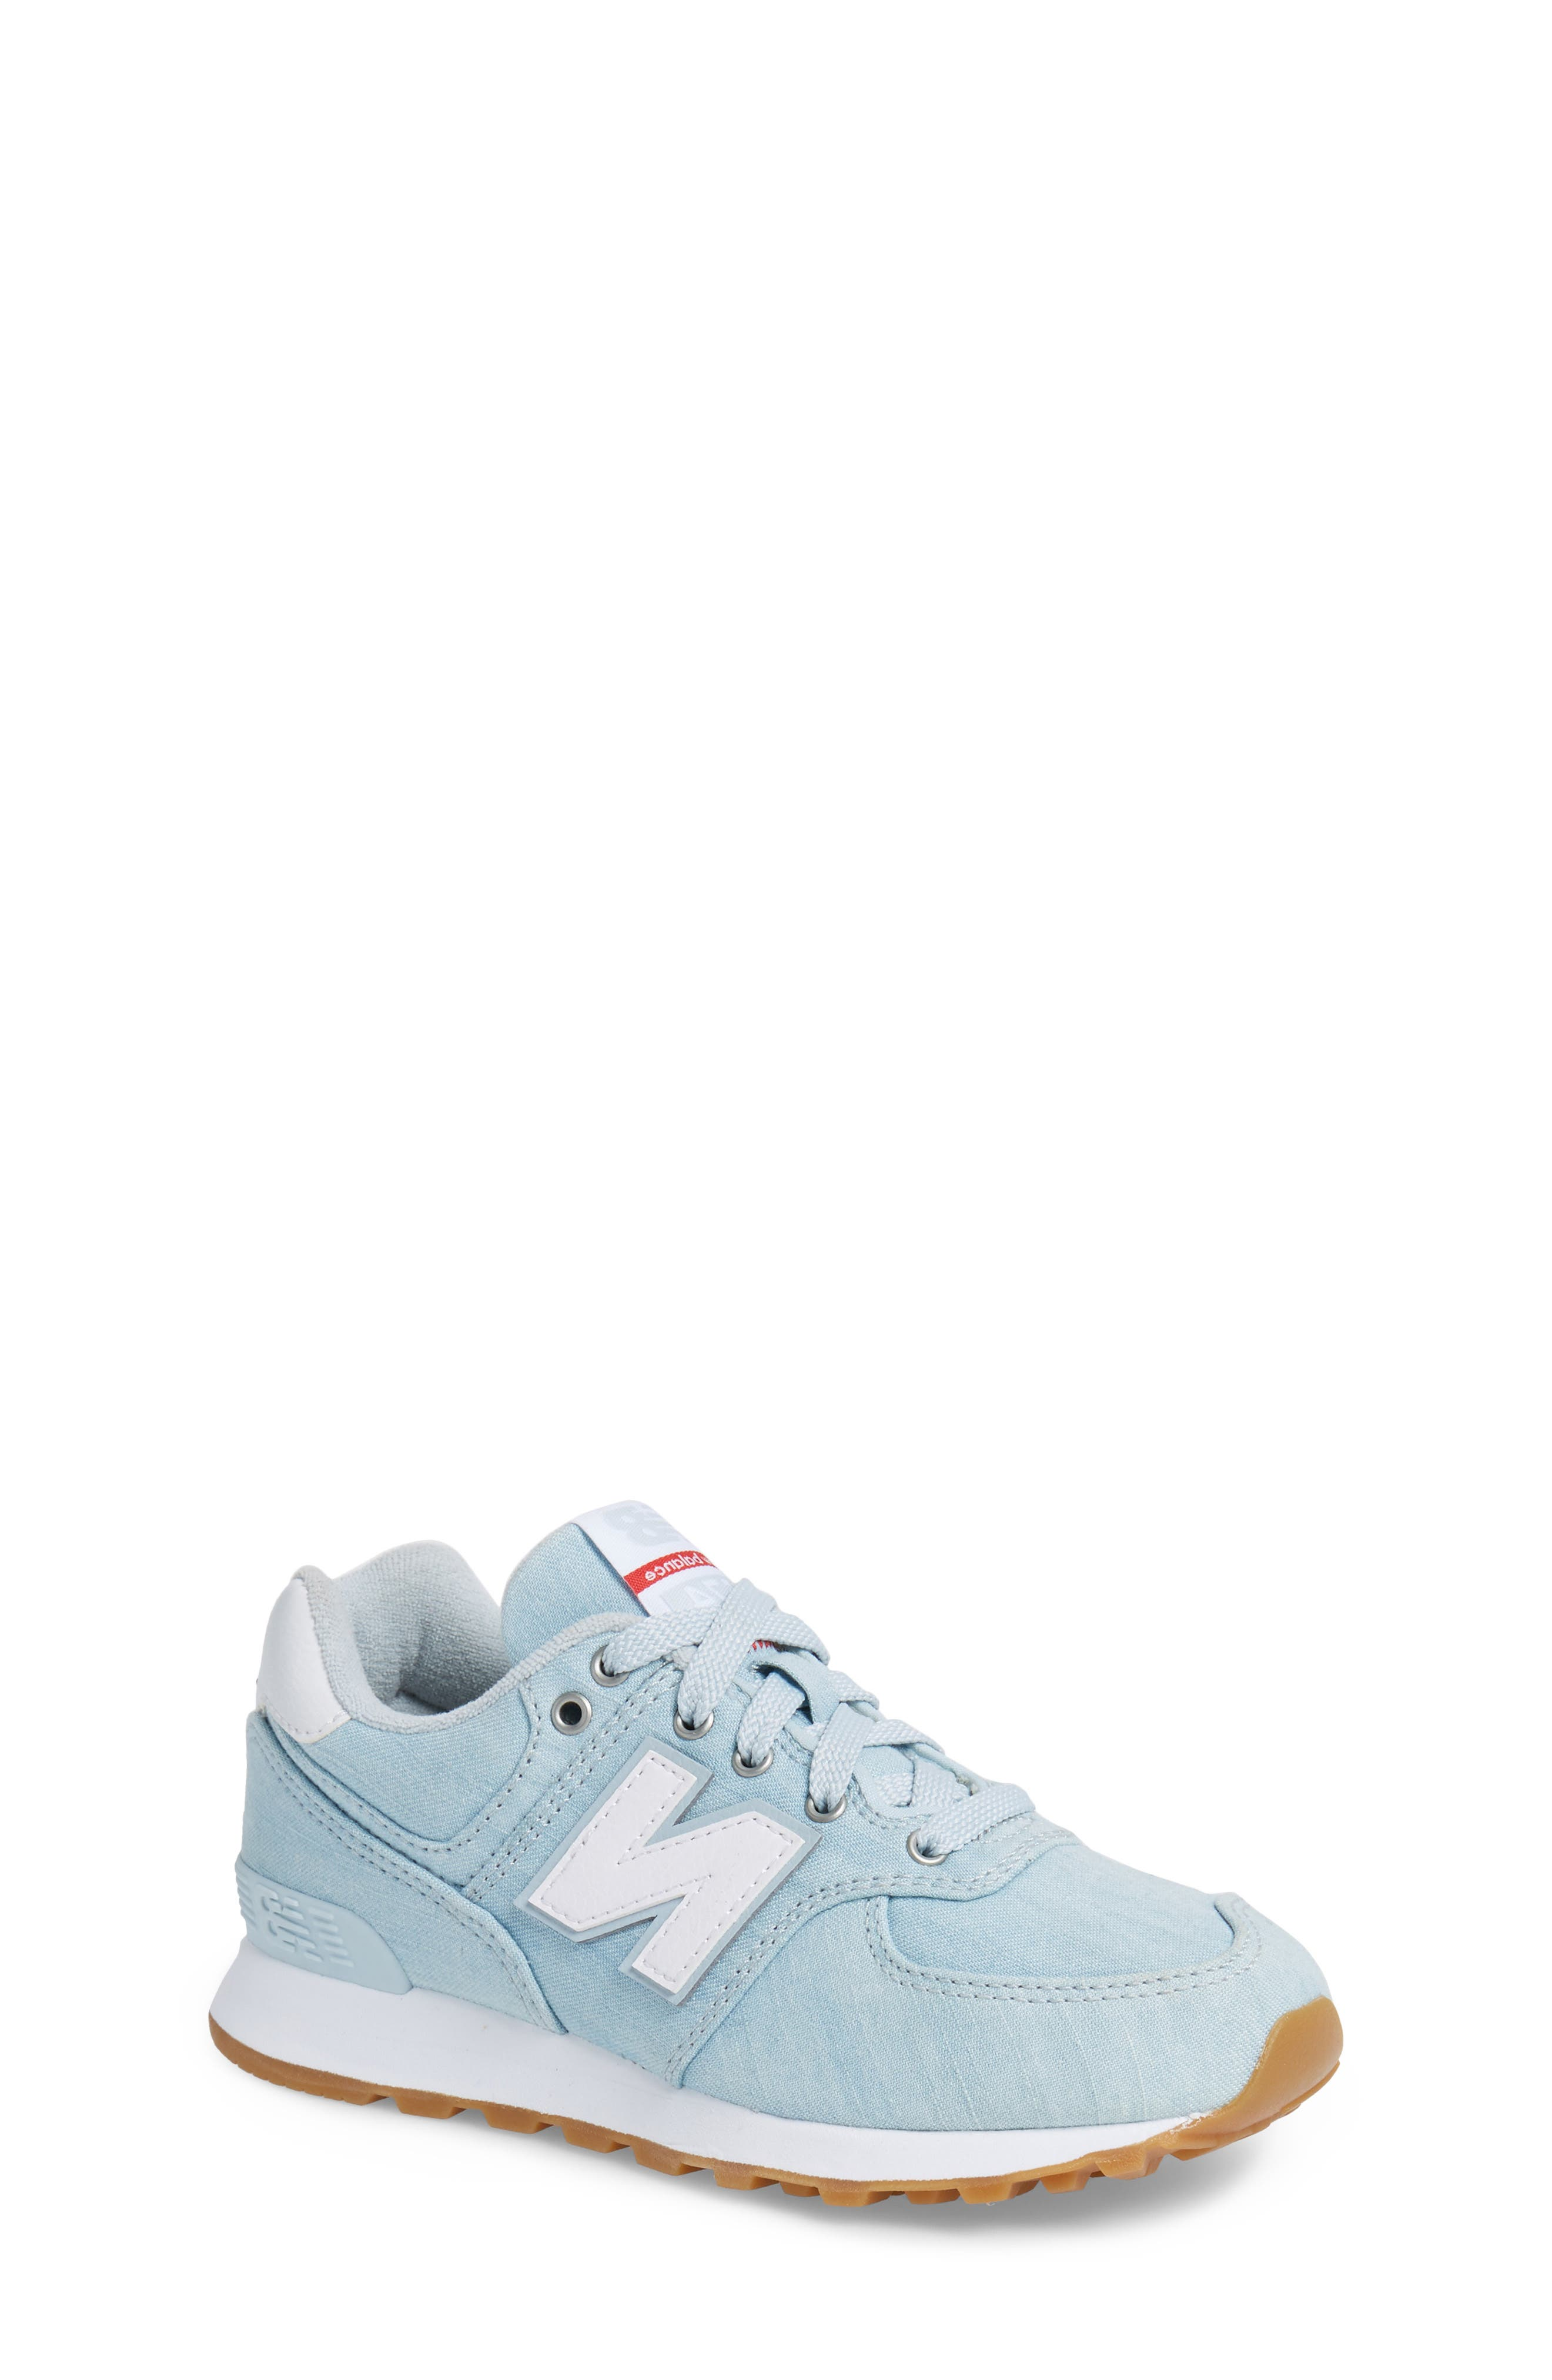 574v1 Sneaker,                             Main thumbnail 1, color,                             419